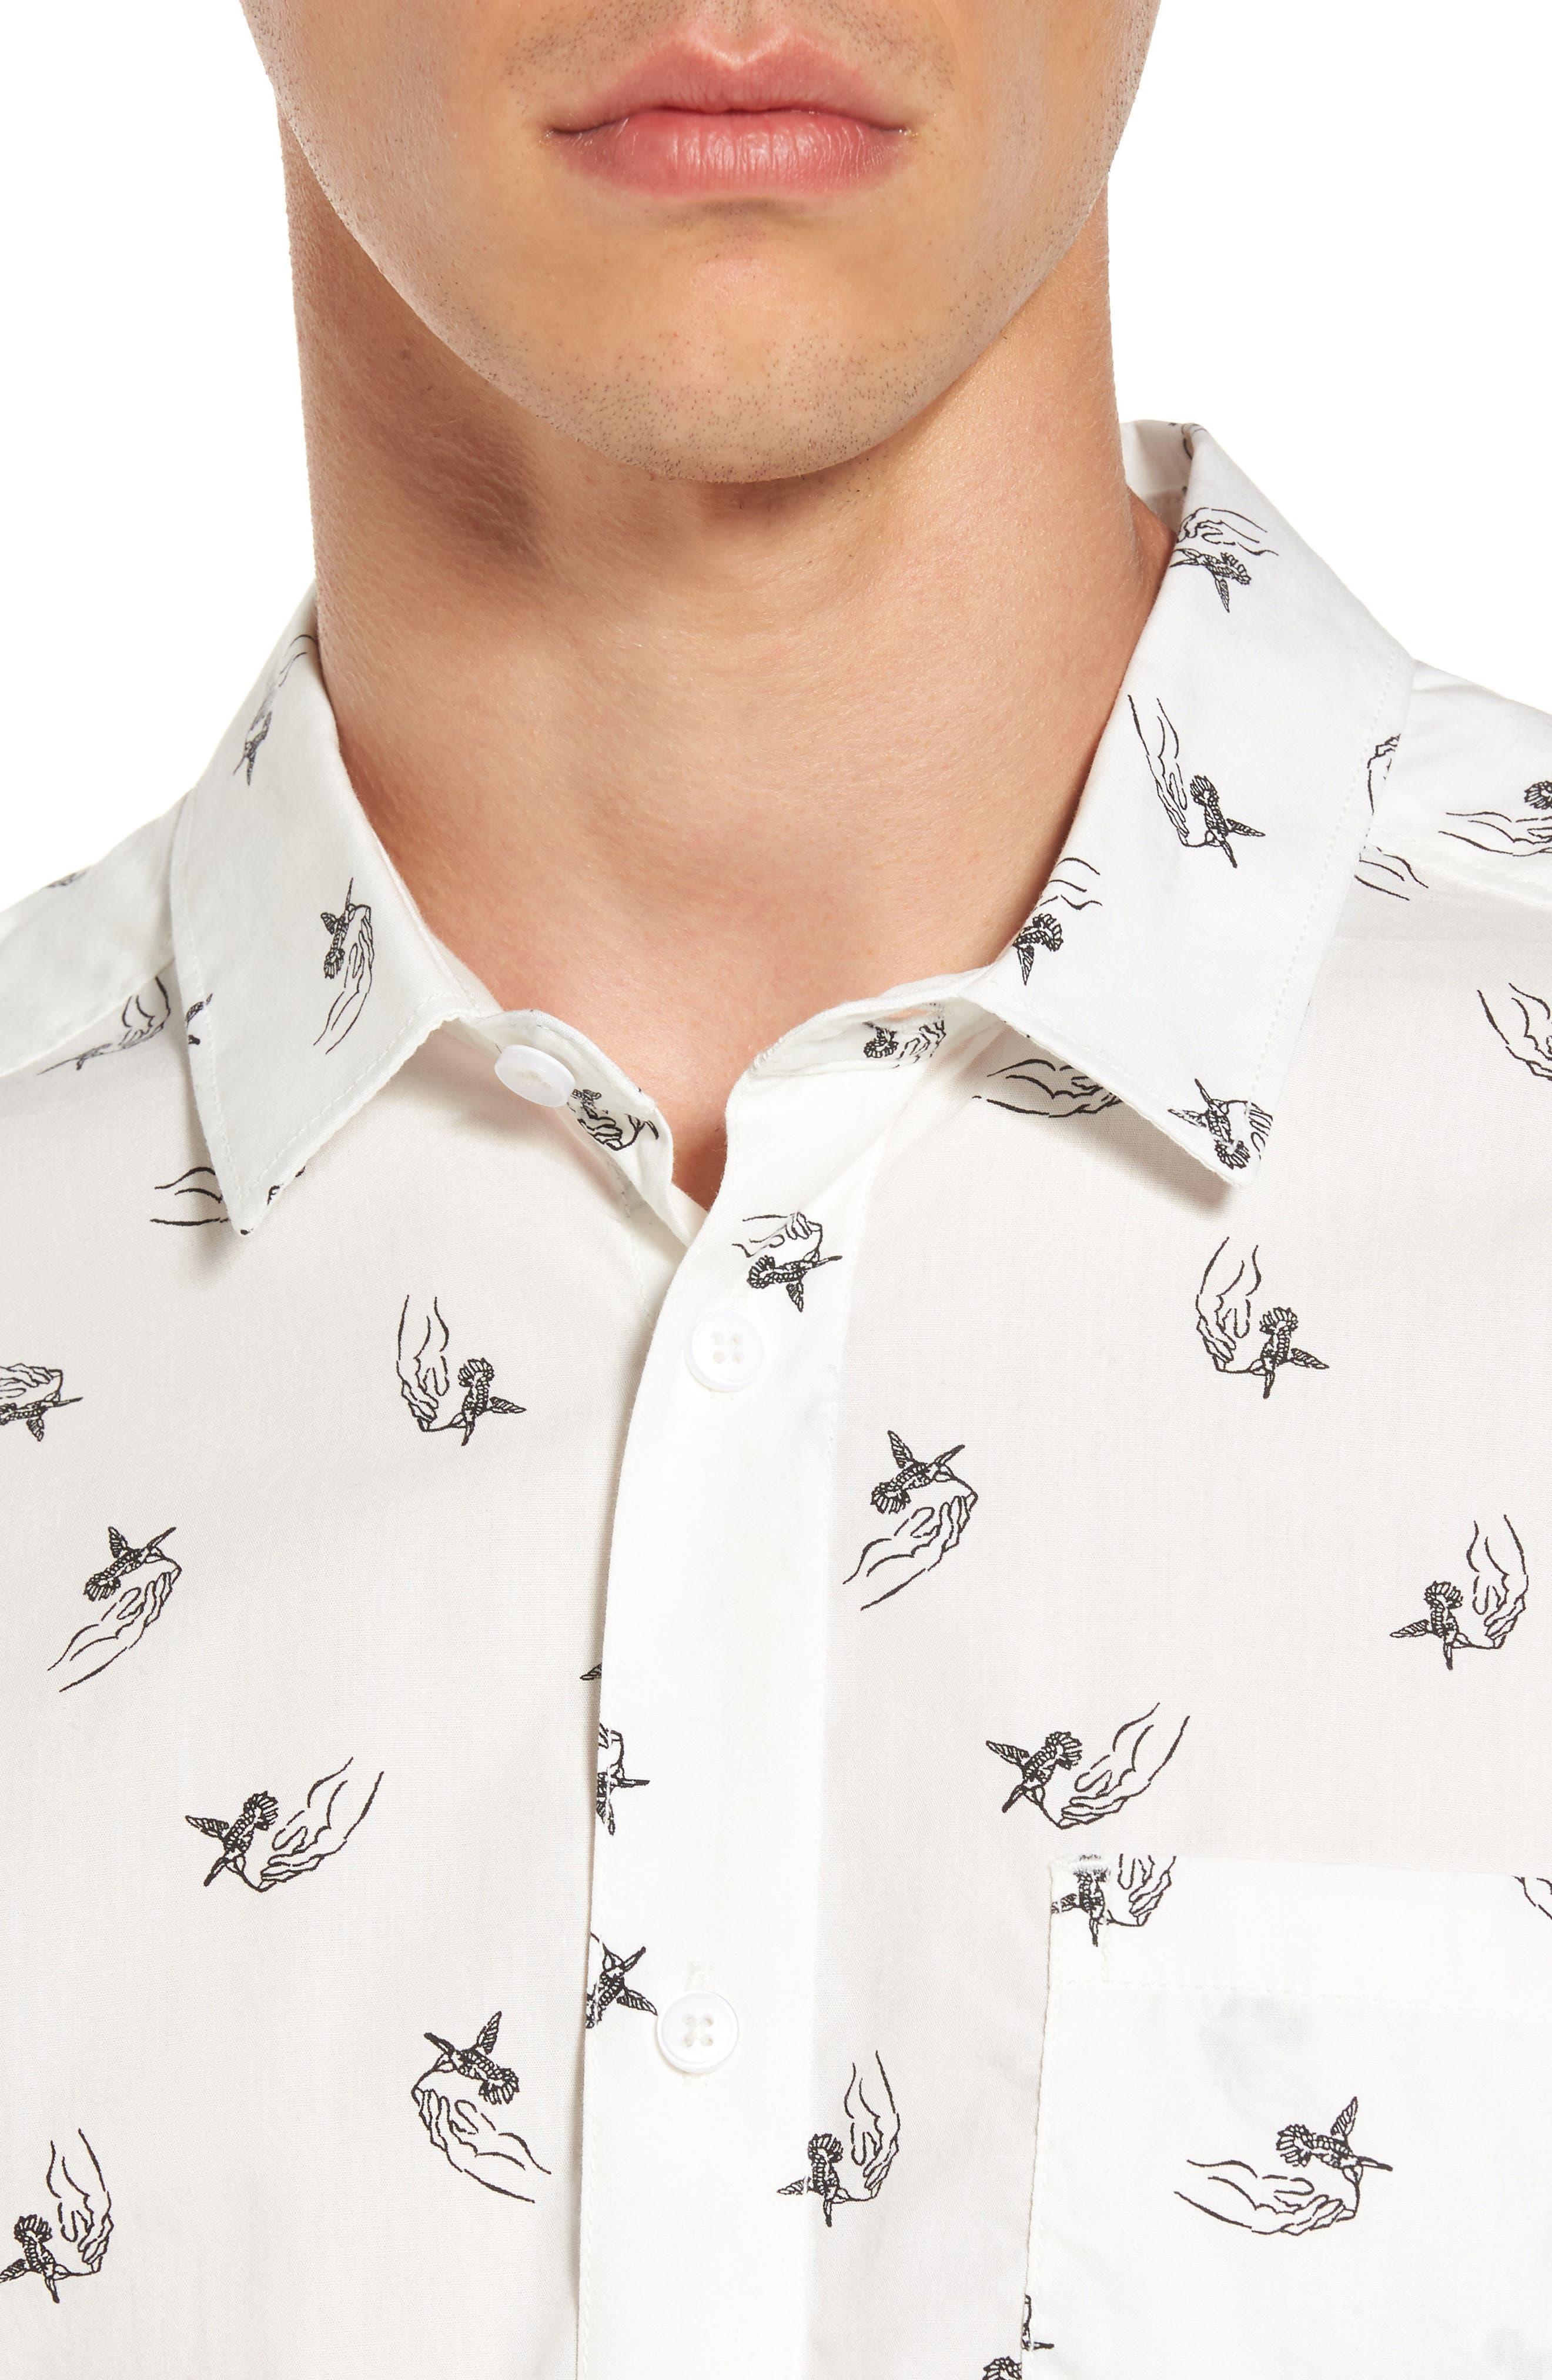 x Kevin Long Hummingbird Woven Shirt,                             Alternate thumbnail 4, color,                             Antique White